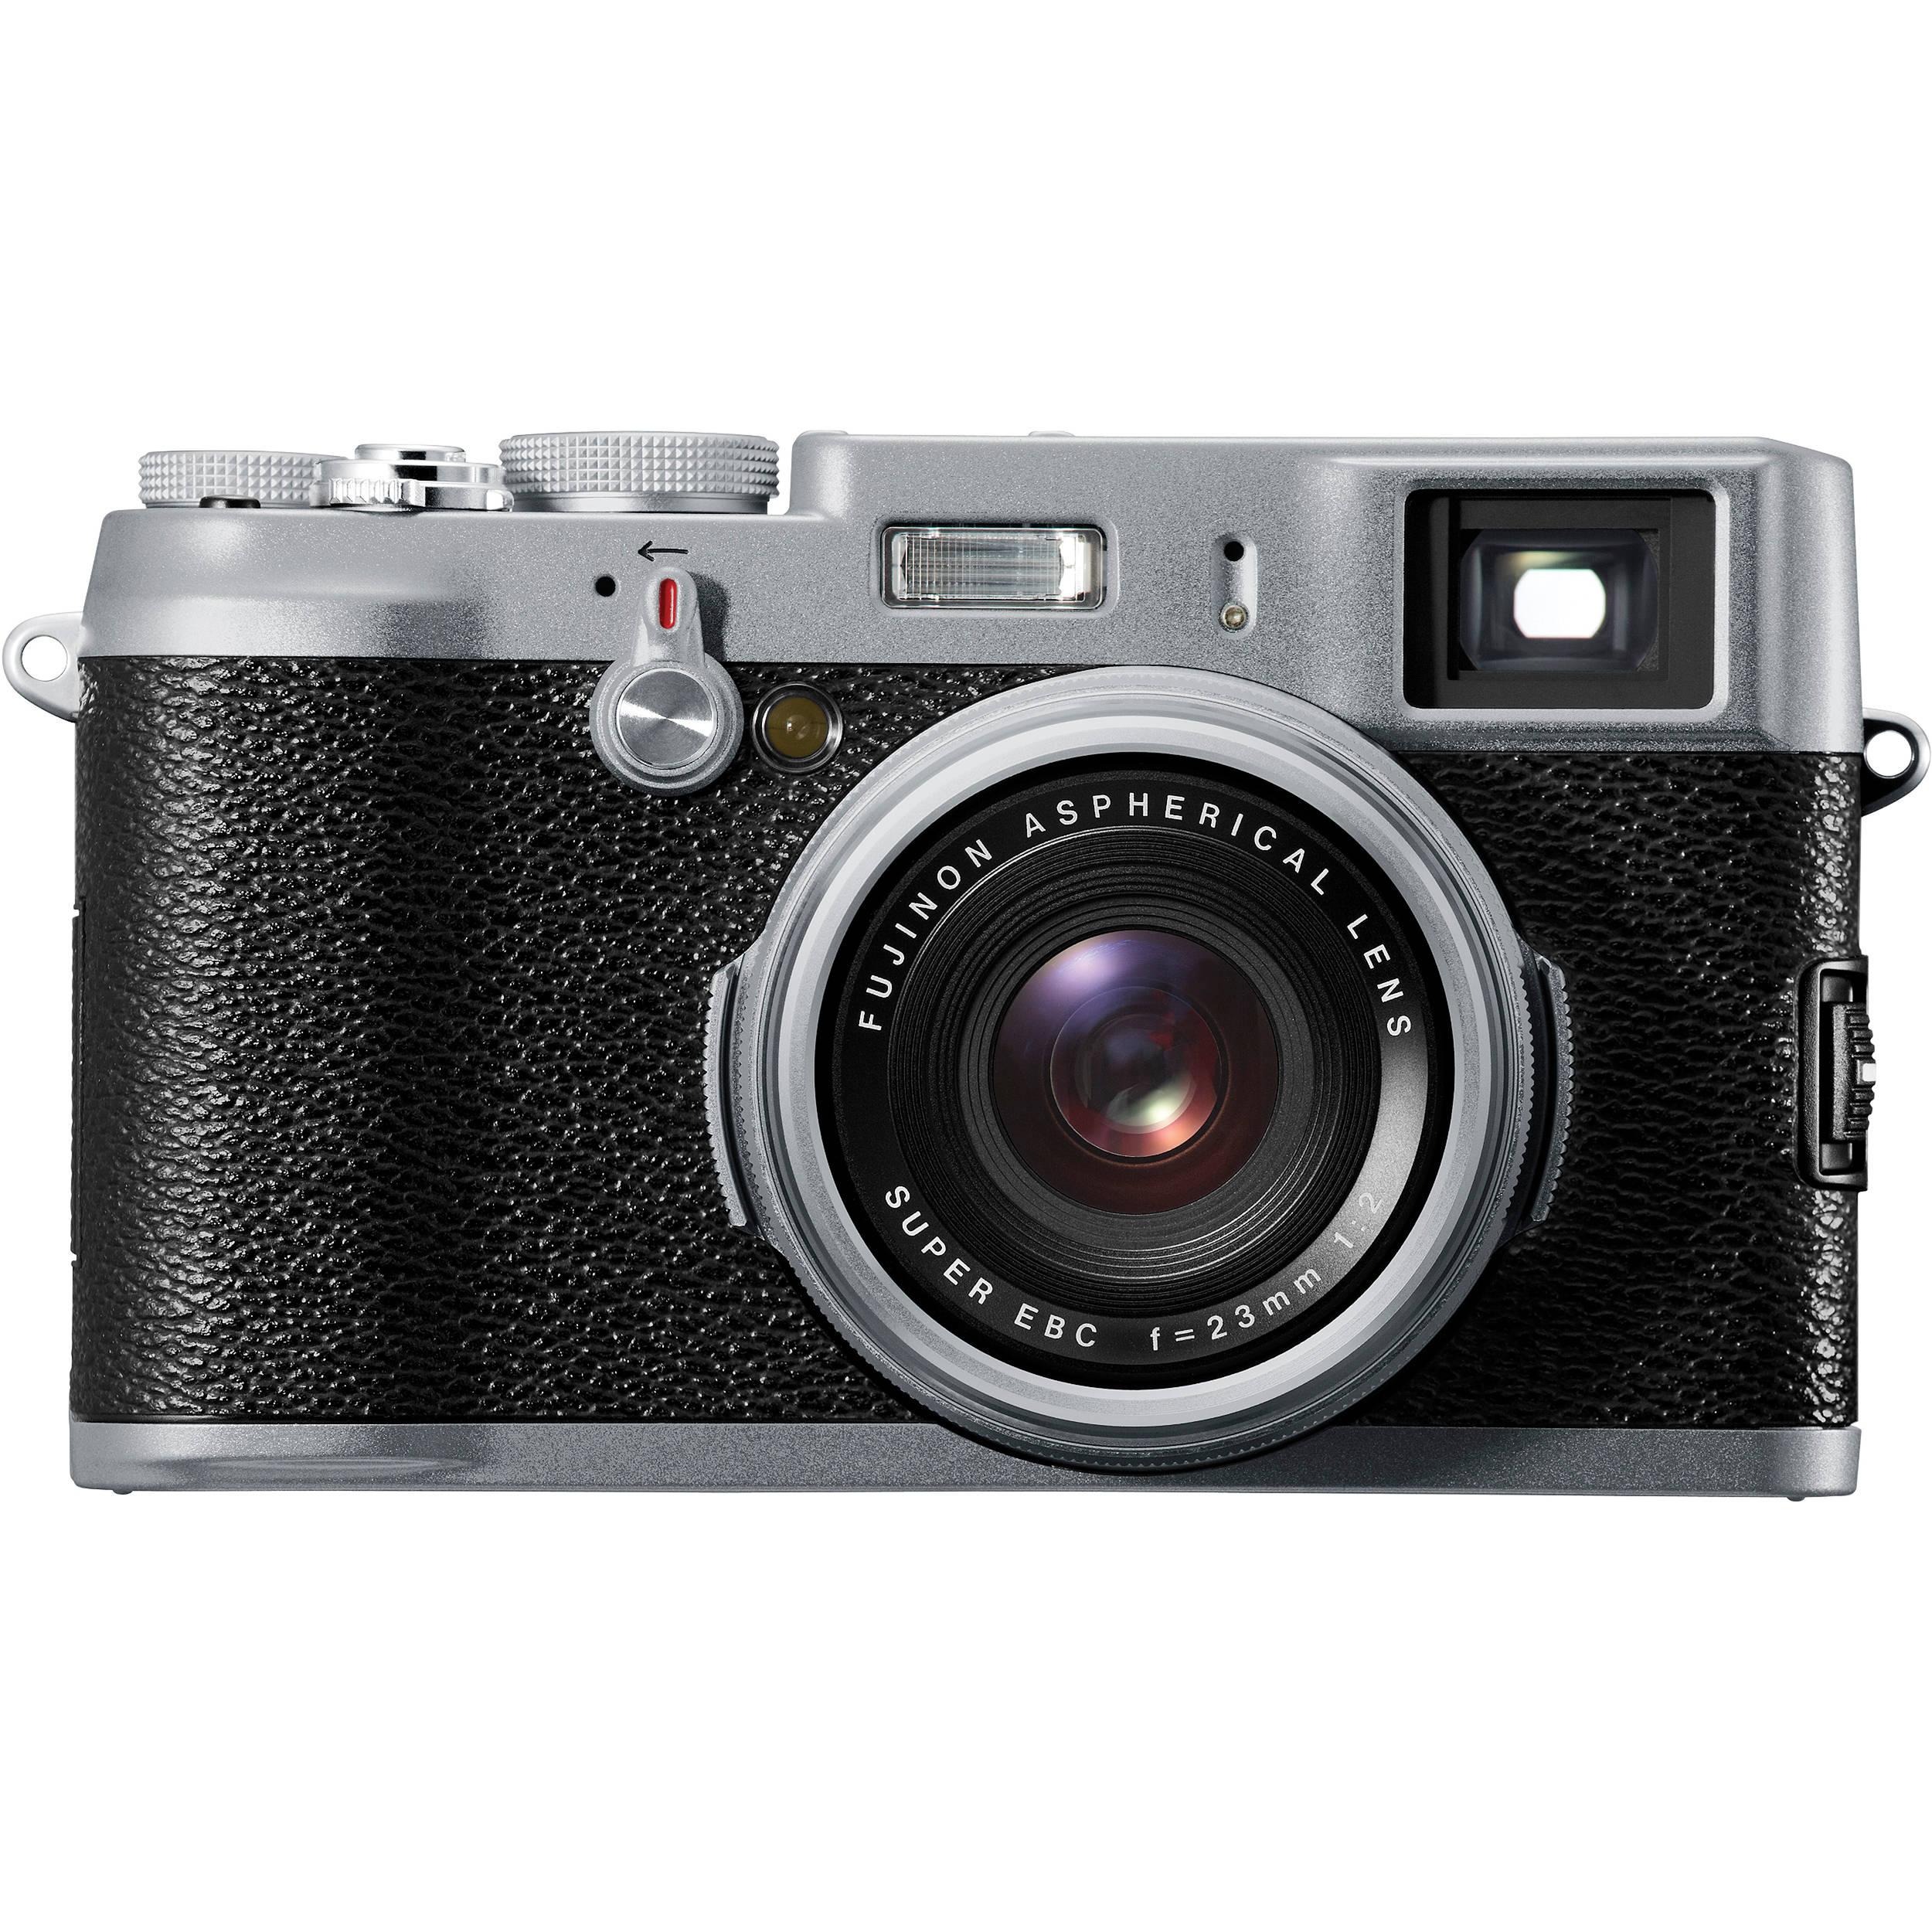 FUJIFILM FinePix X100 Digital Camera